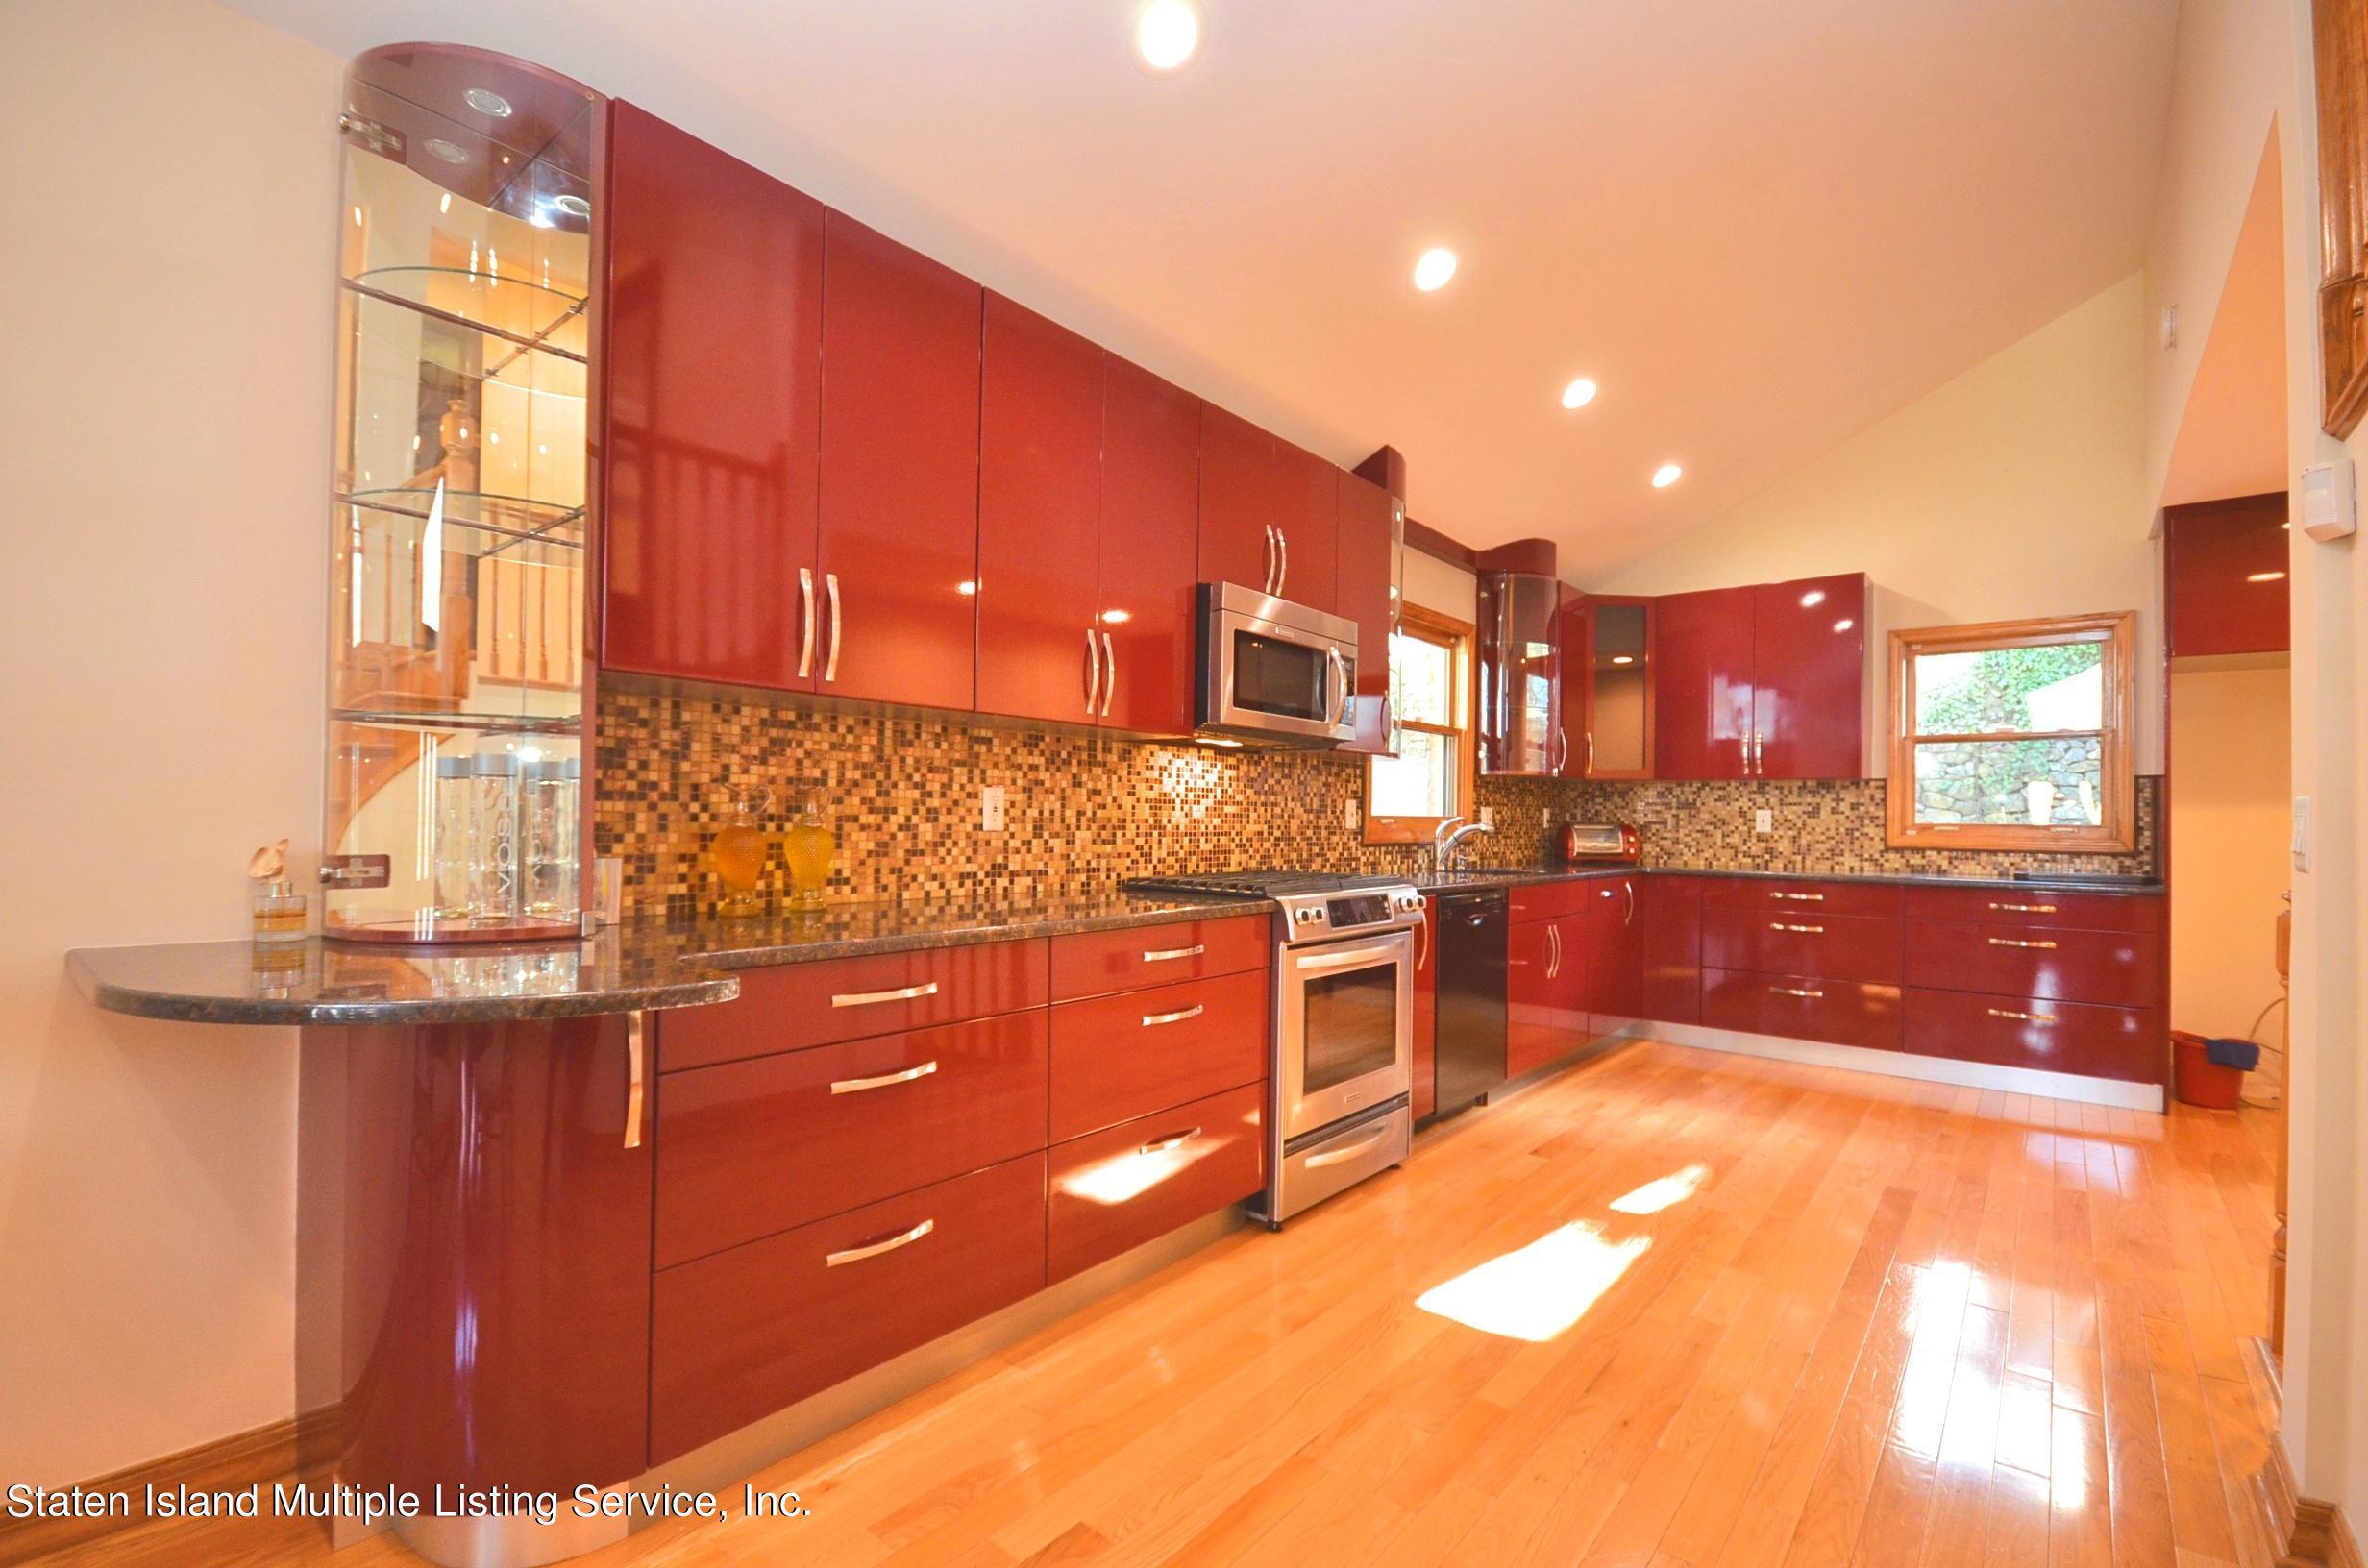 Single Family - Detached 48 Ocean Terrace  Staten Island, NY 10314, MLS-1142240-12